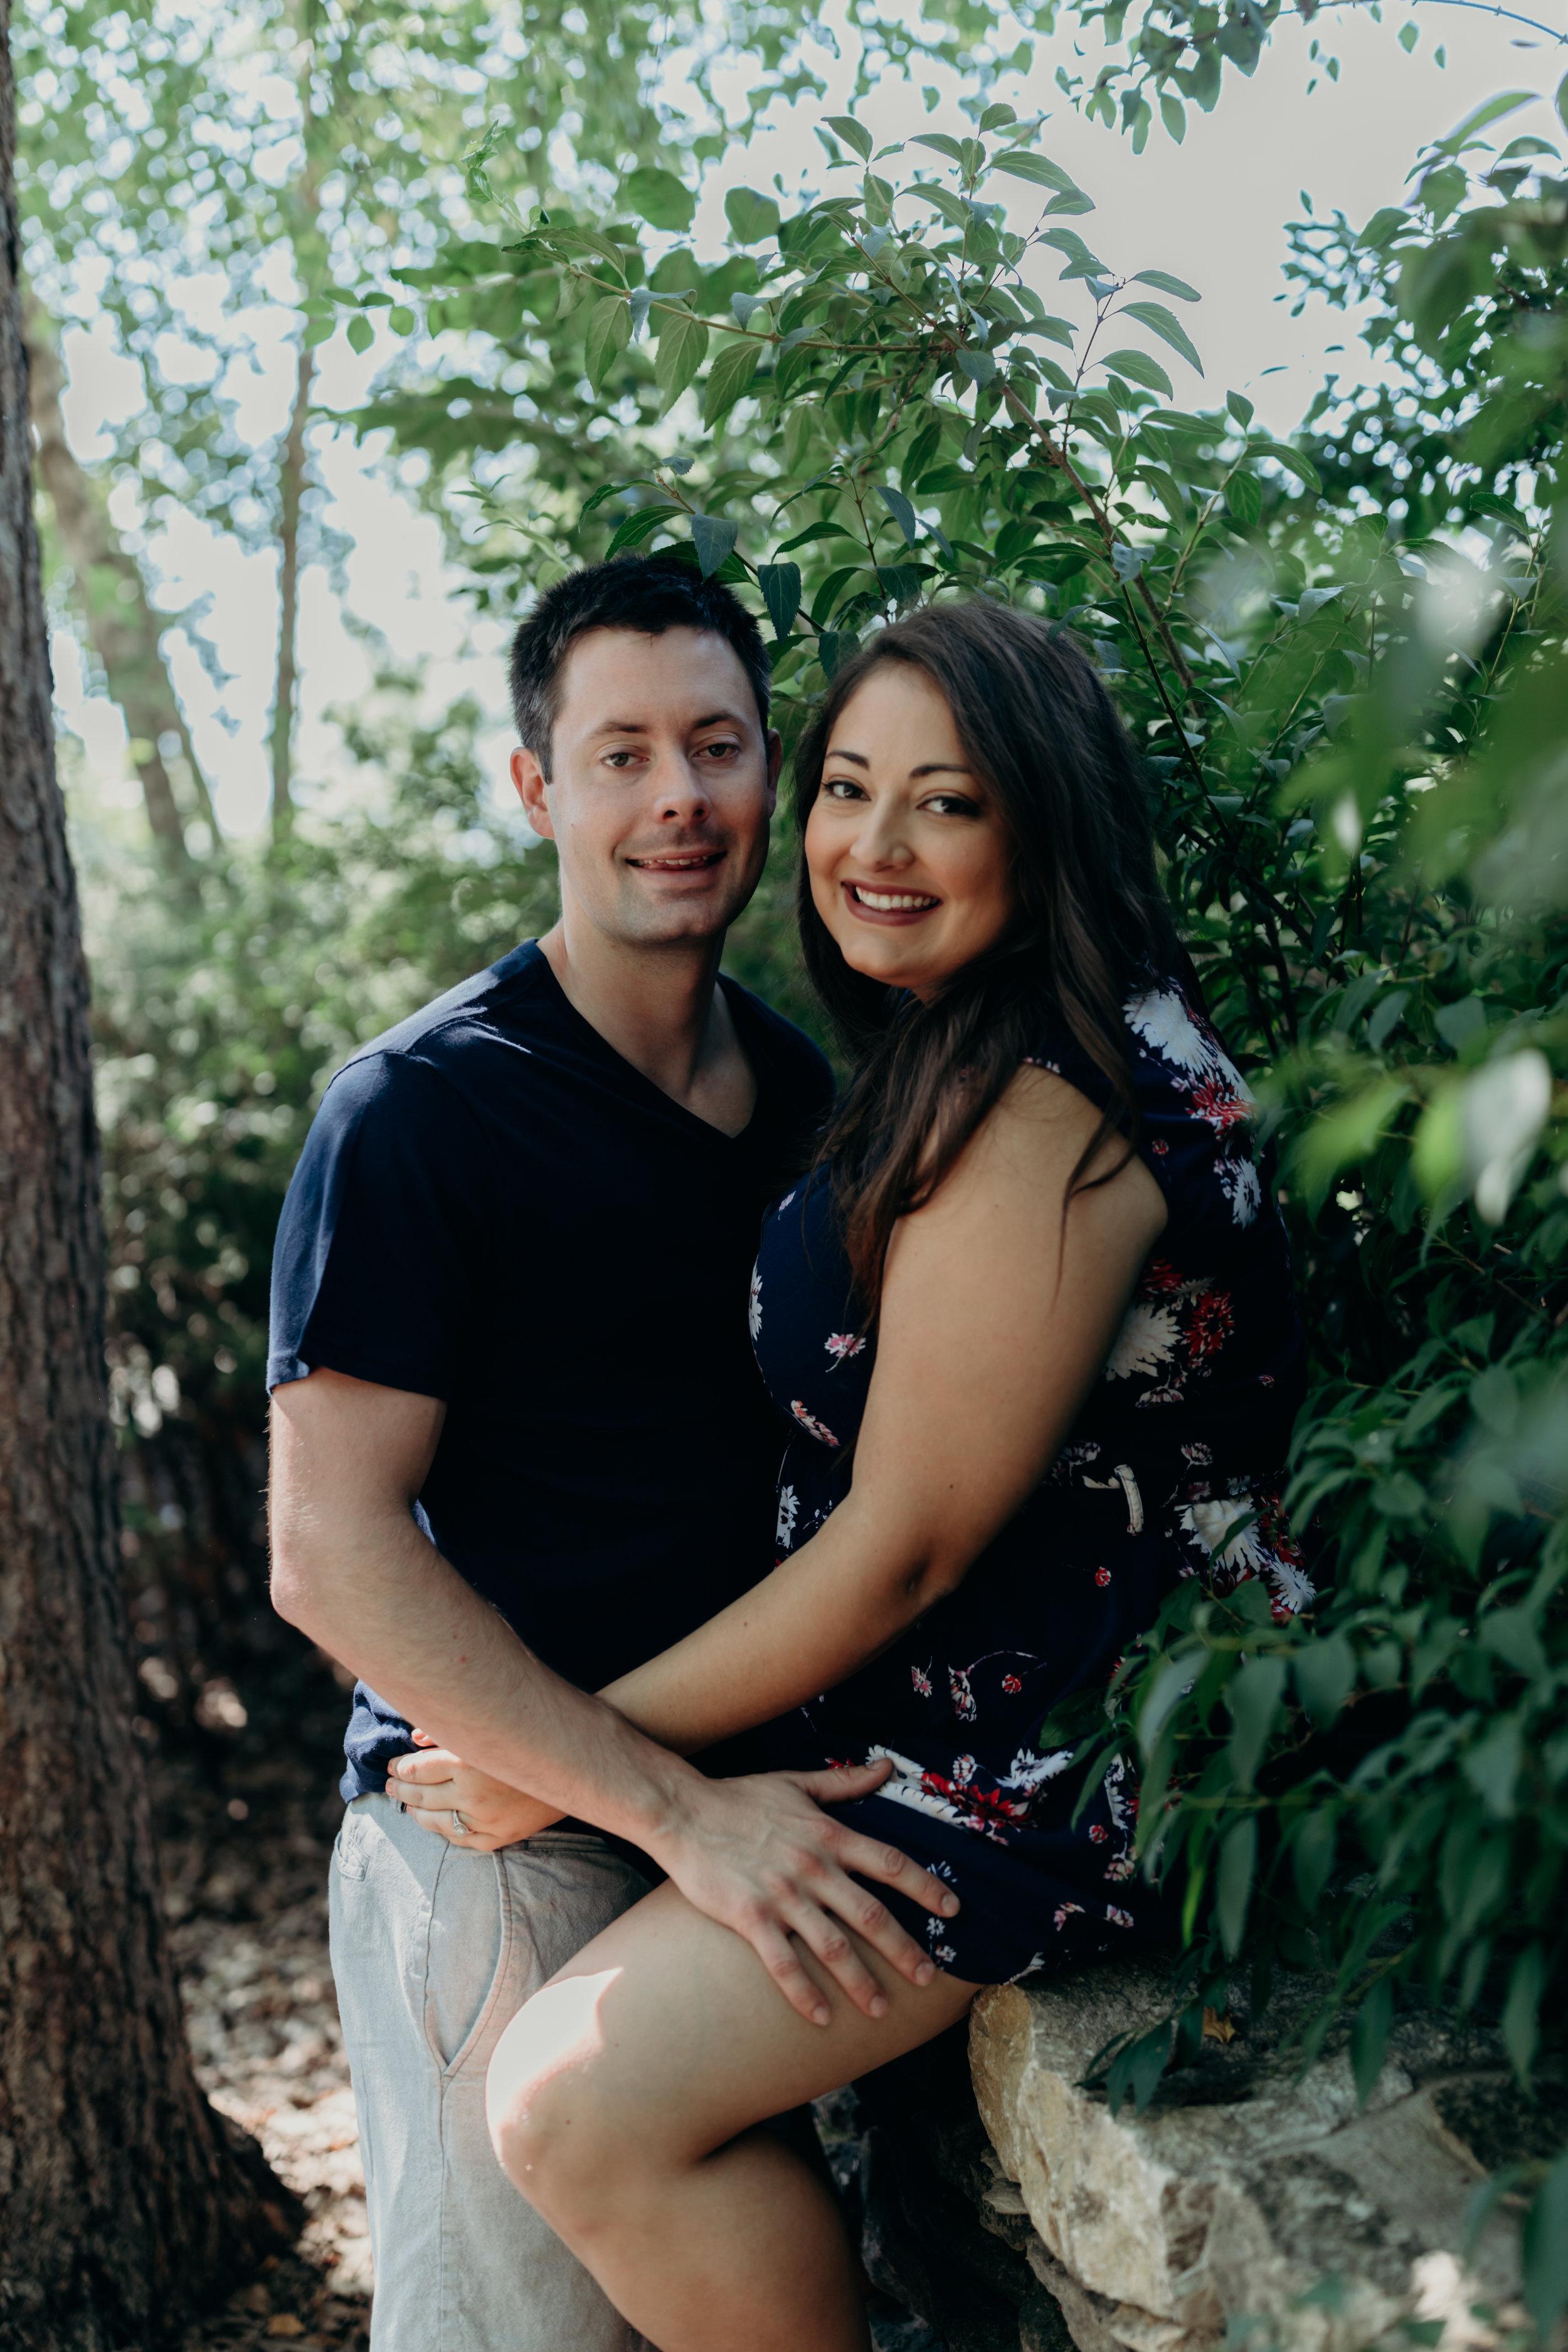 Nicole&MattPregnancyAnnouncement-5.jpg